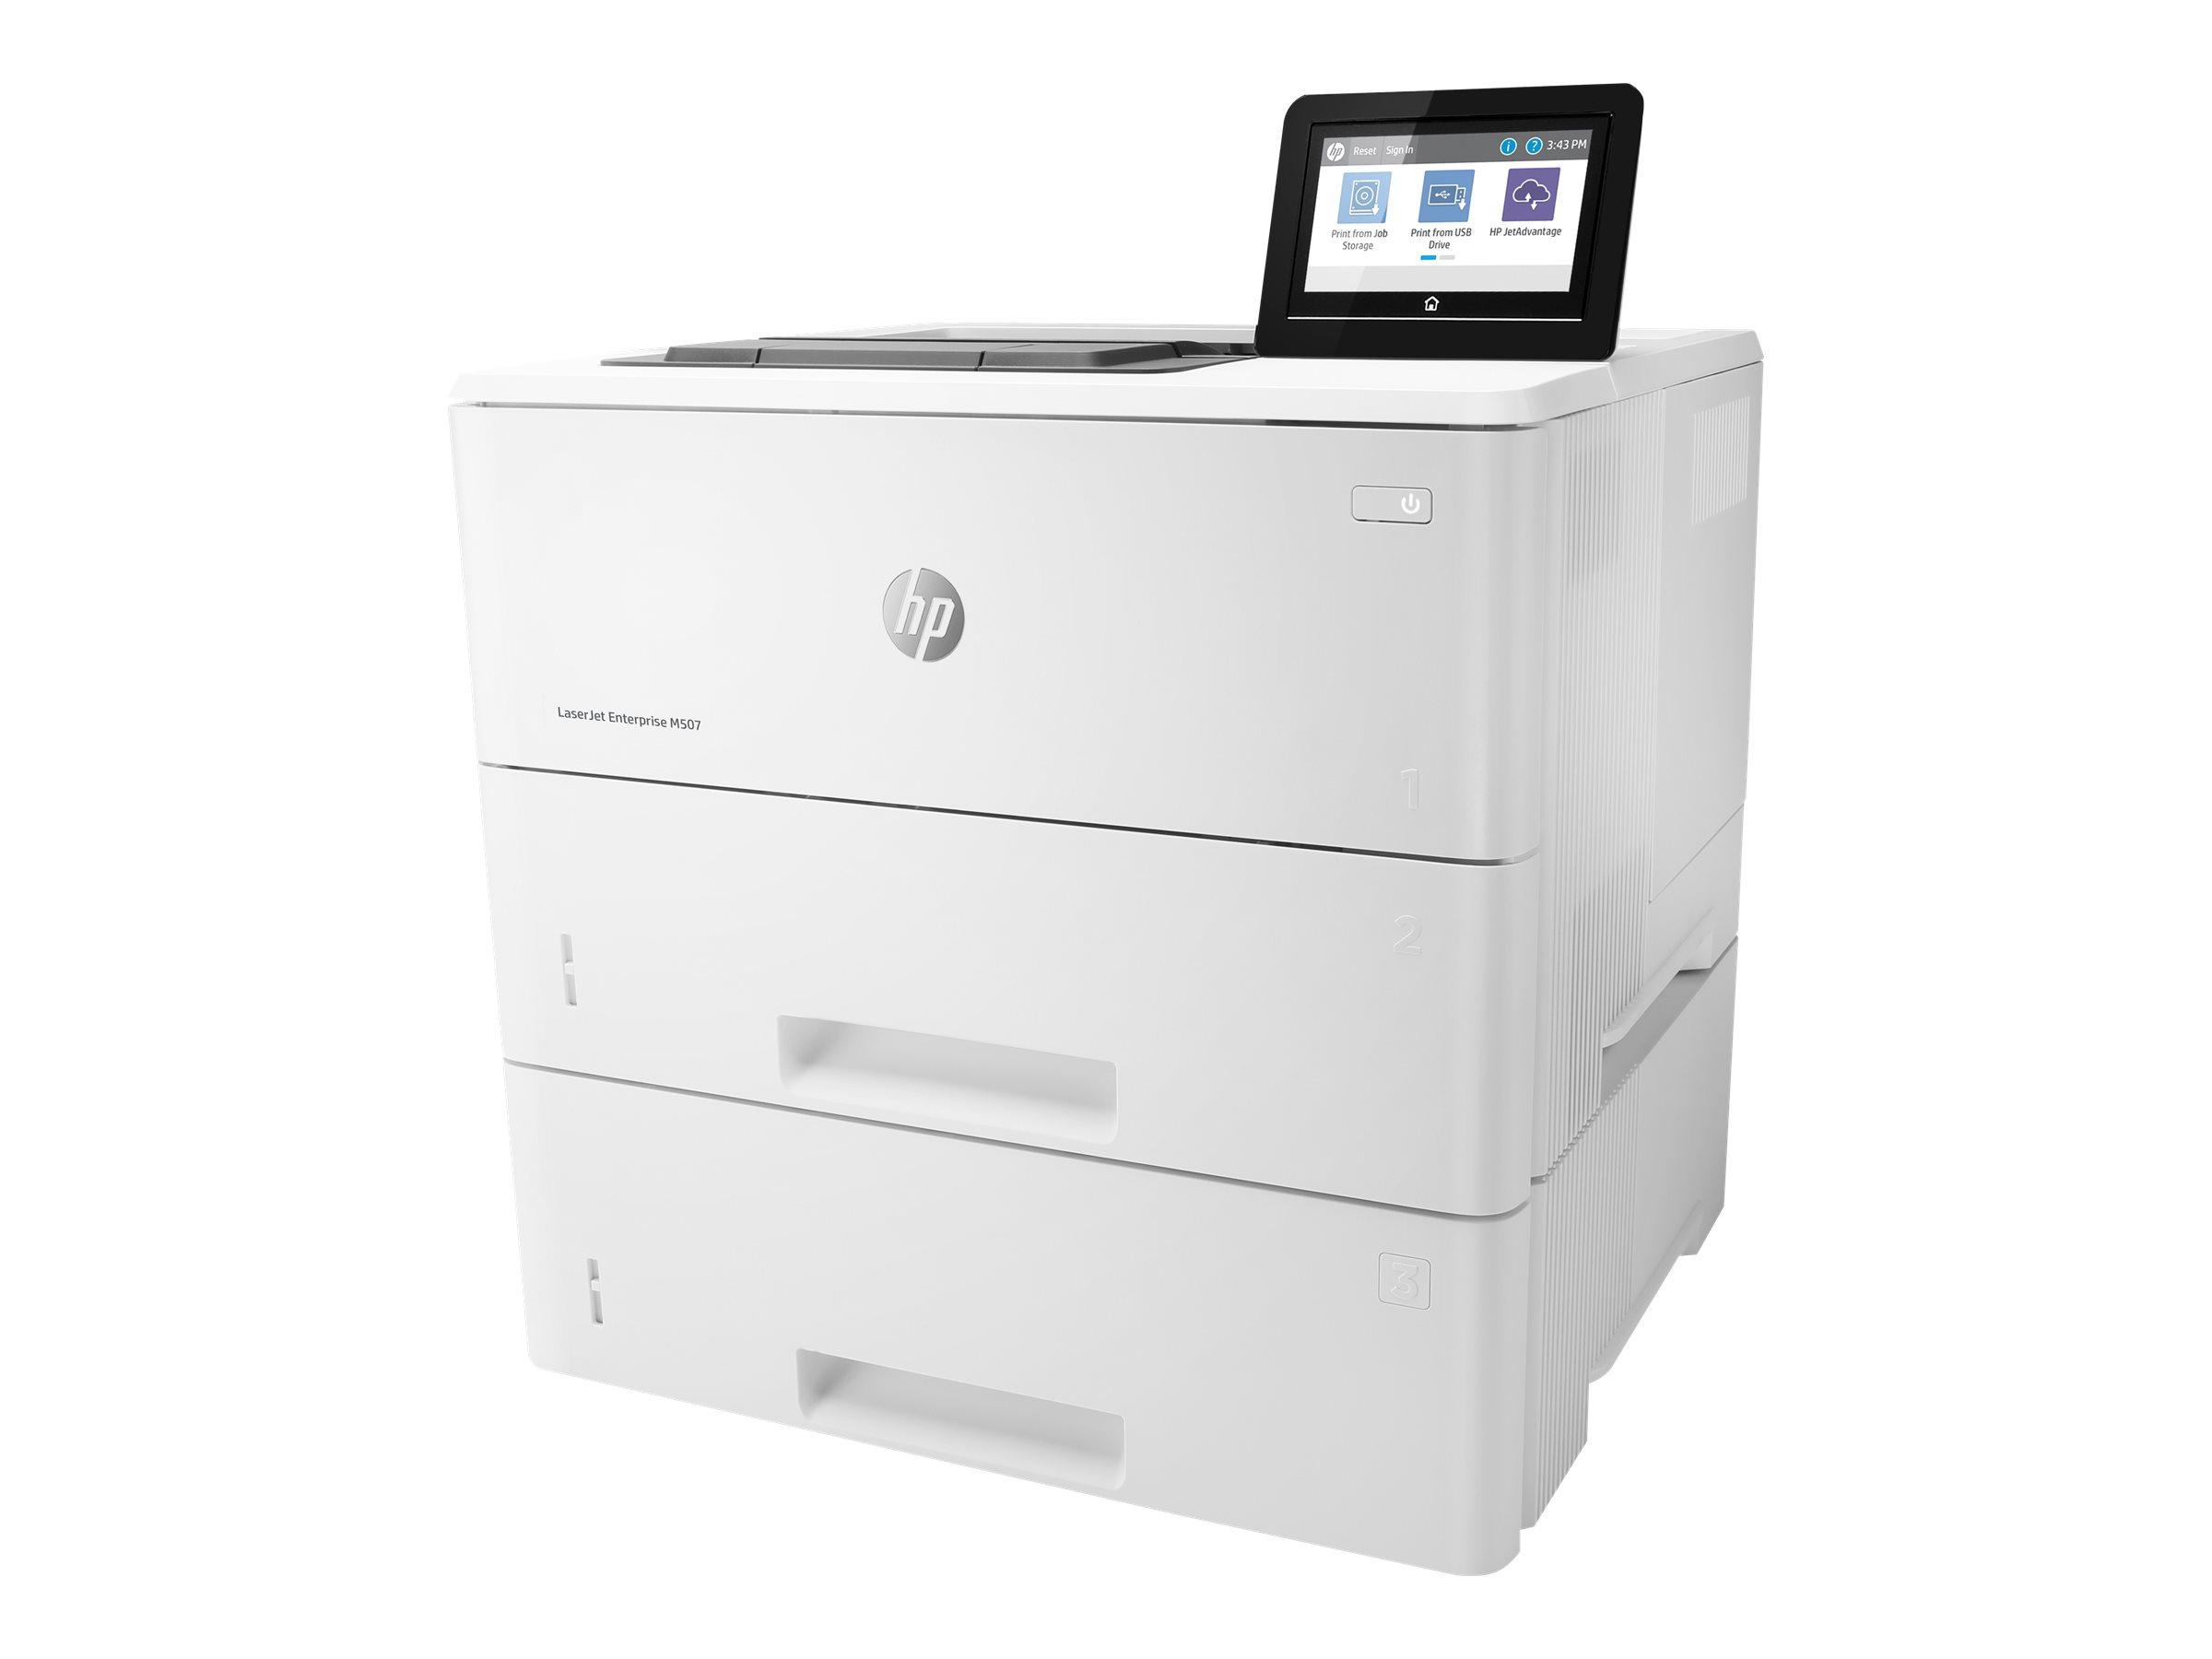 HP LaserJet Enterprise M507x, S/W Laser, A4